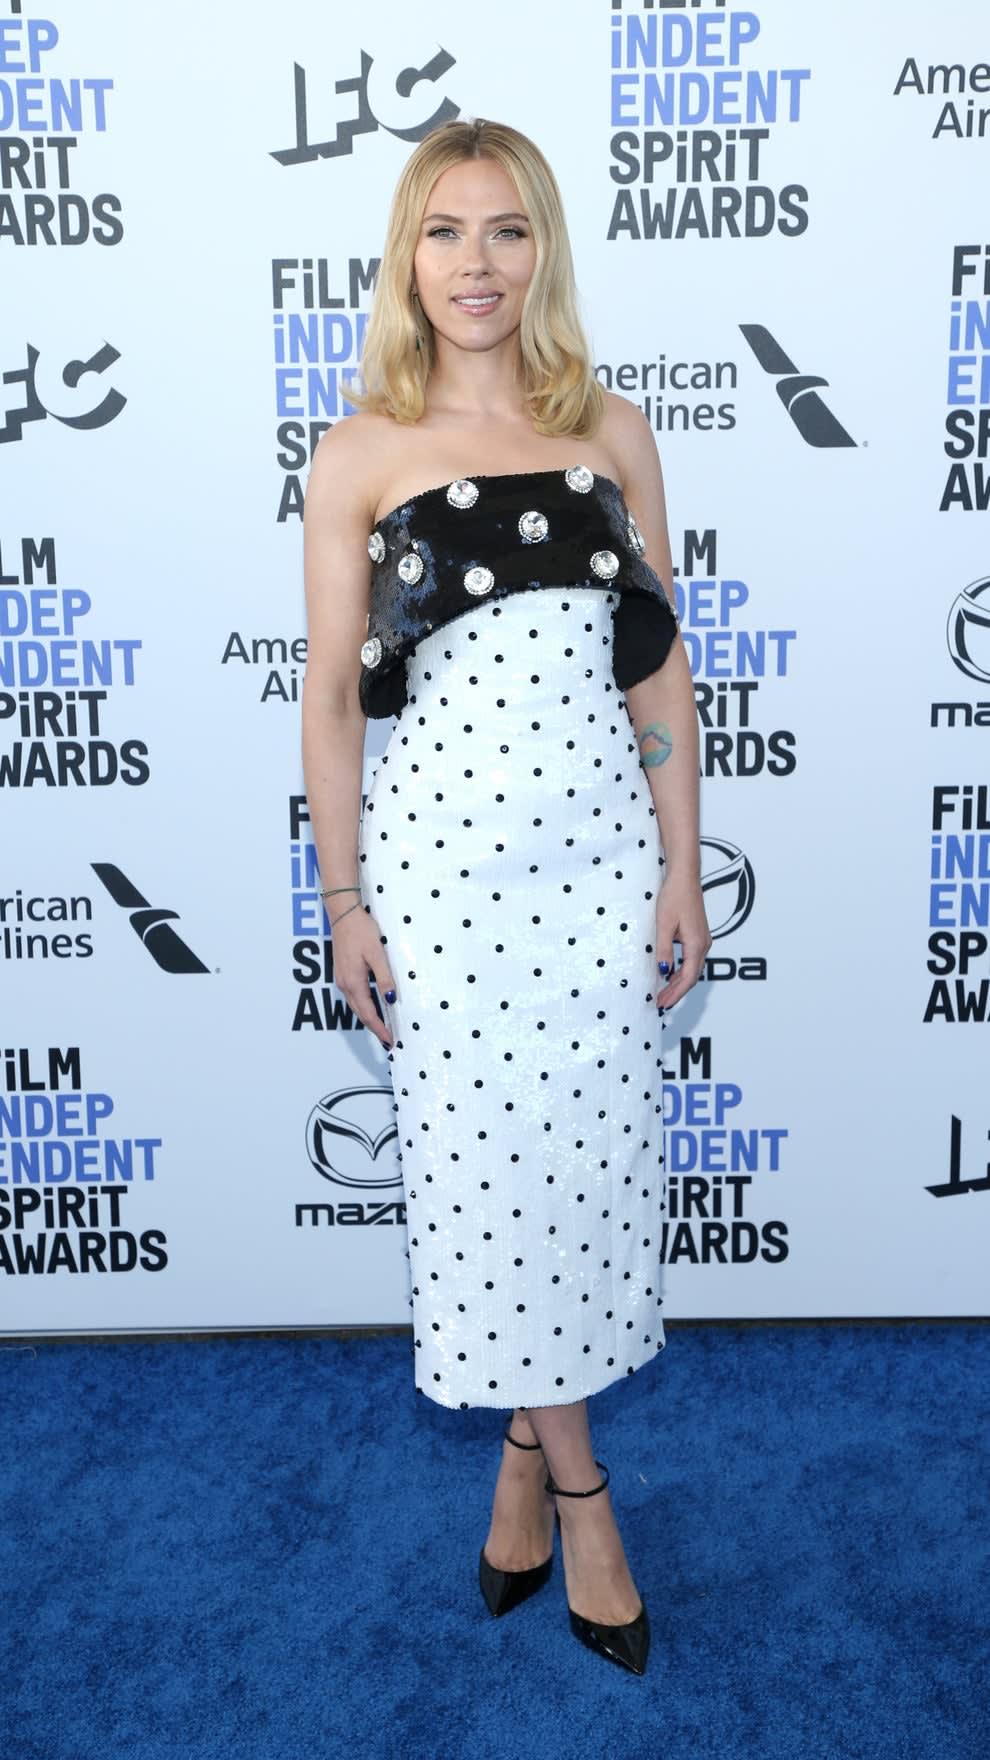 Scarlett wears a tea-length dress with polka dots and giant polka dot gems on top.